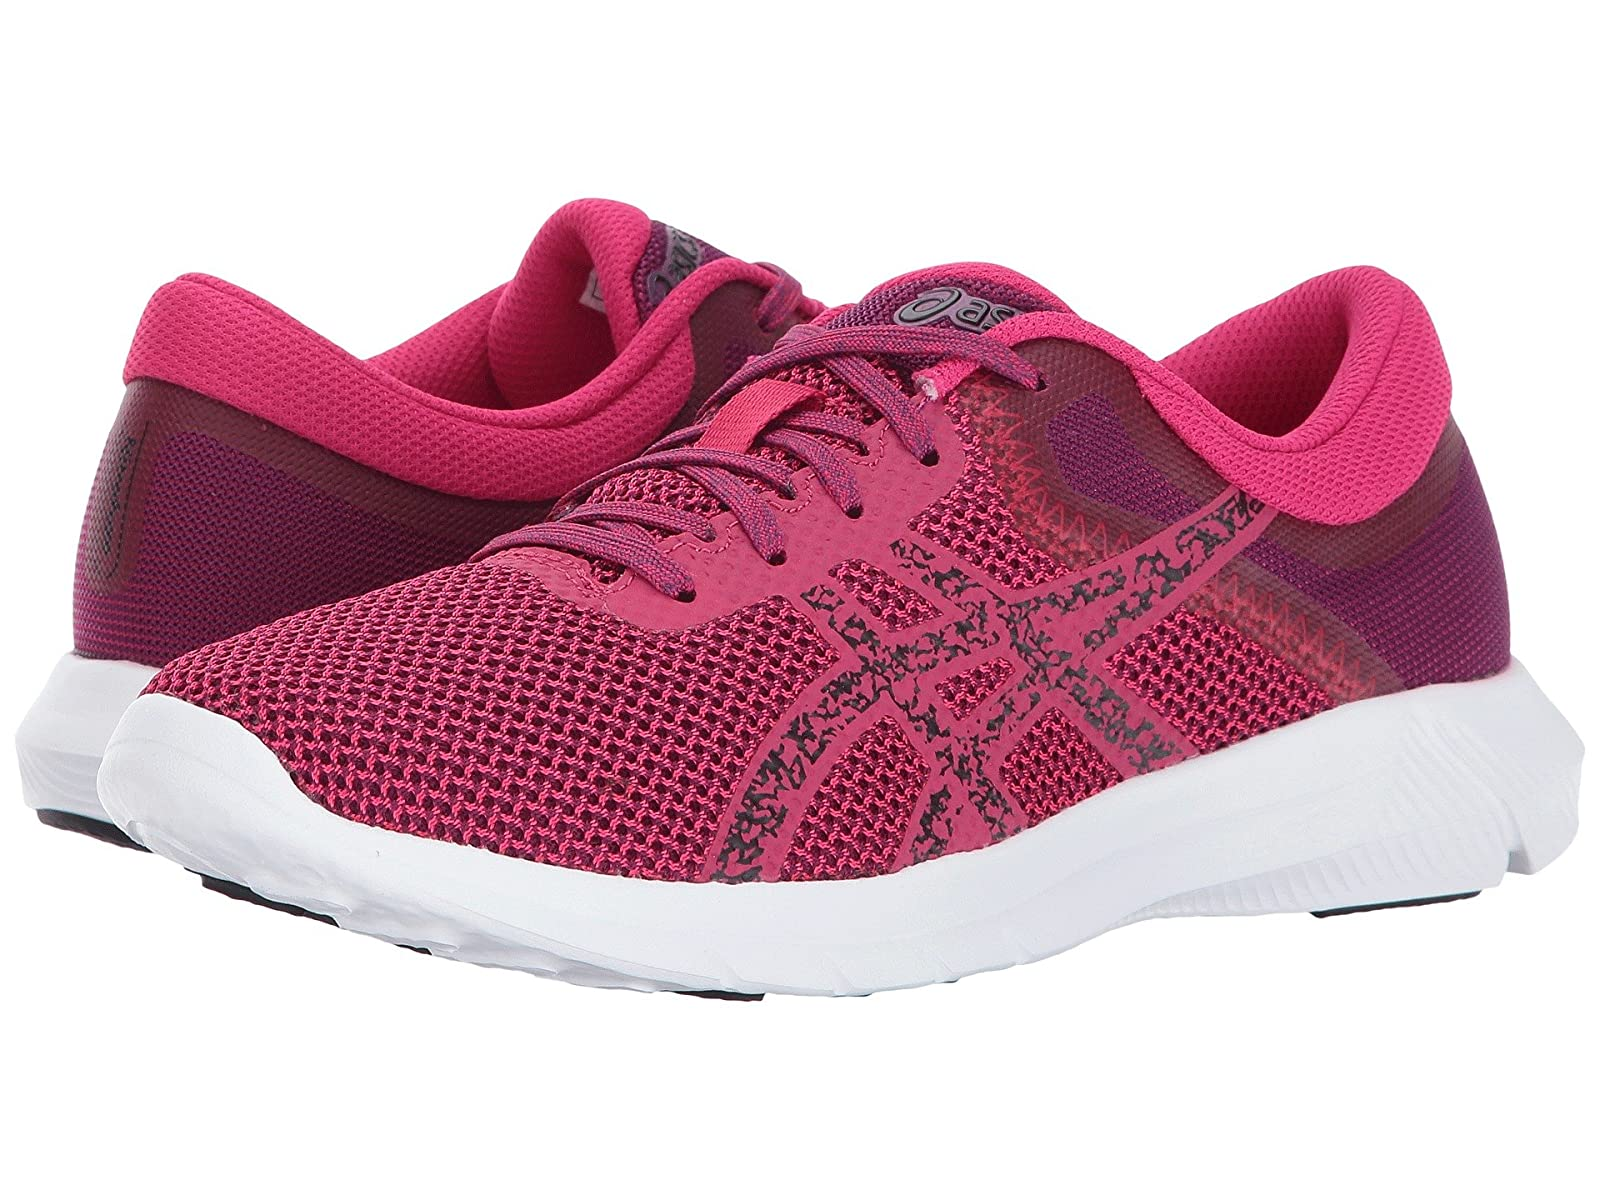 ASICS Nitrofuze 2Cheap and distinctive eye-catching shoes